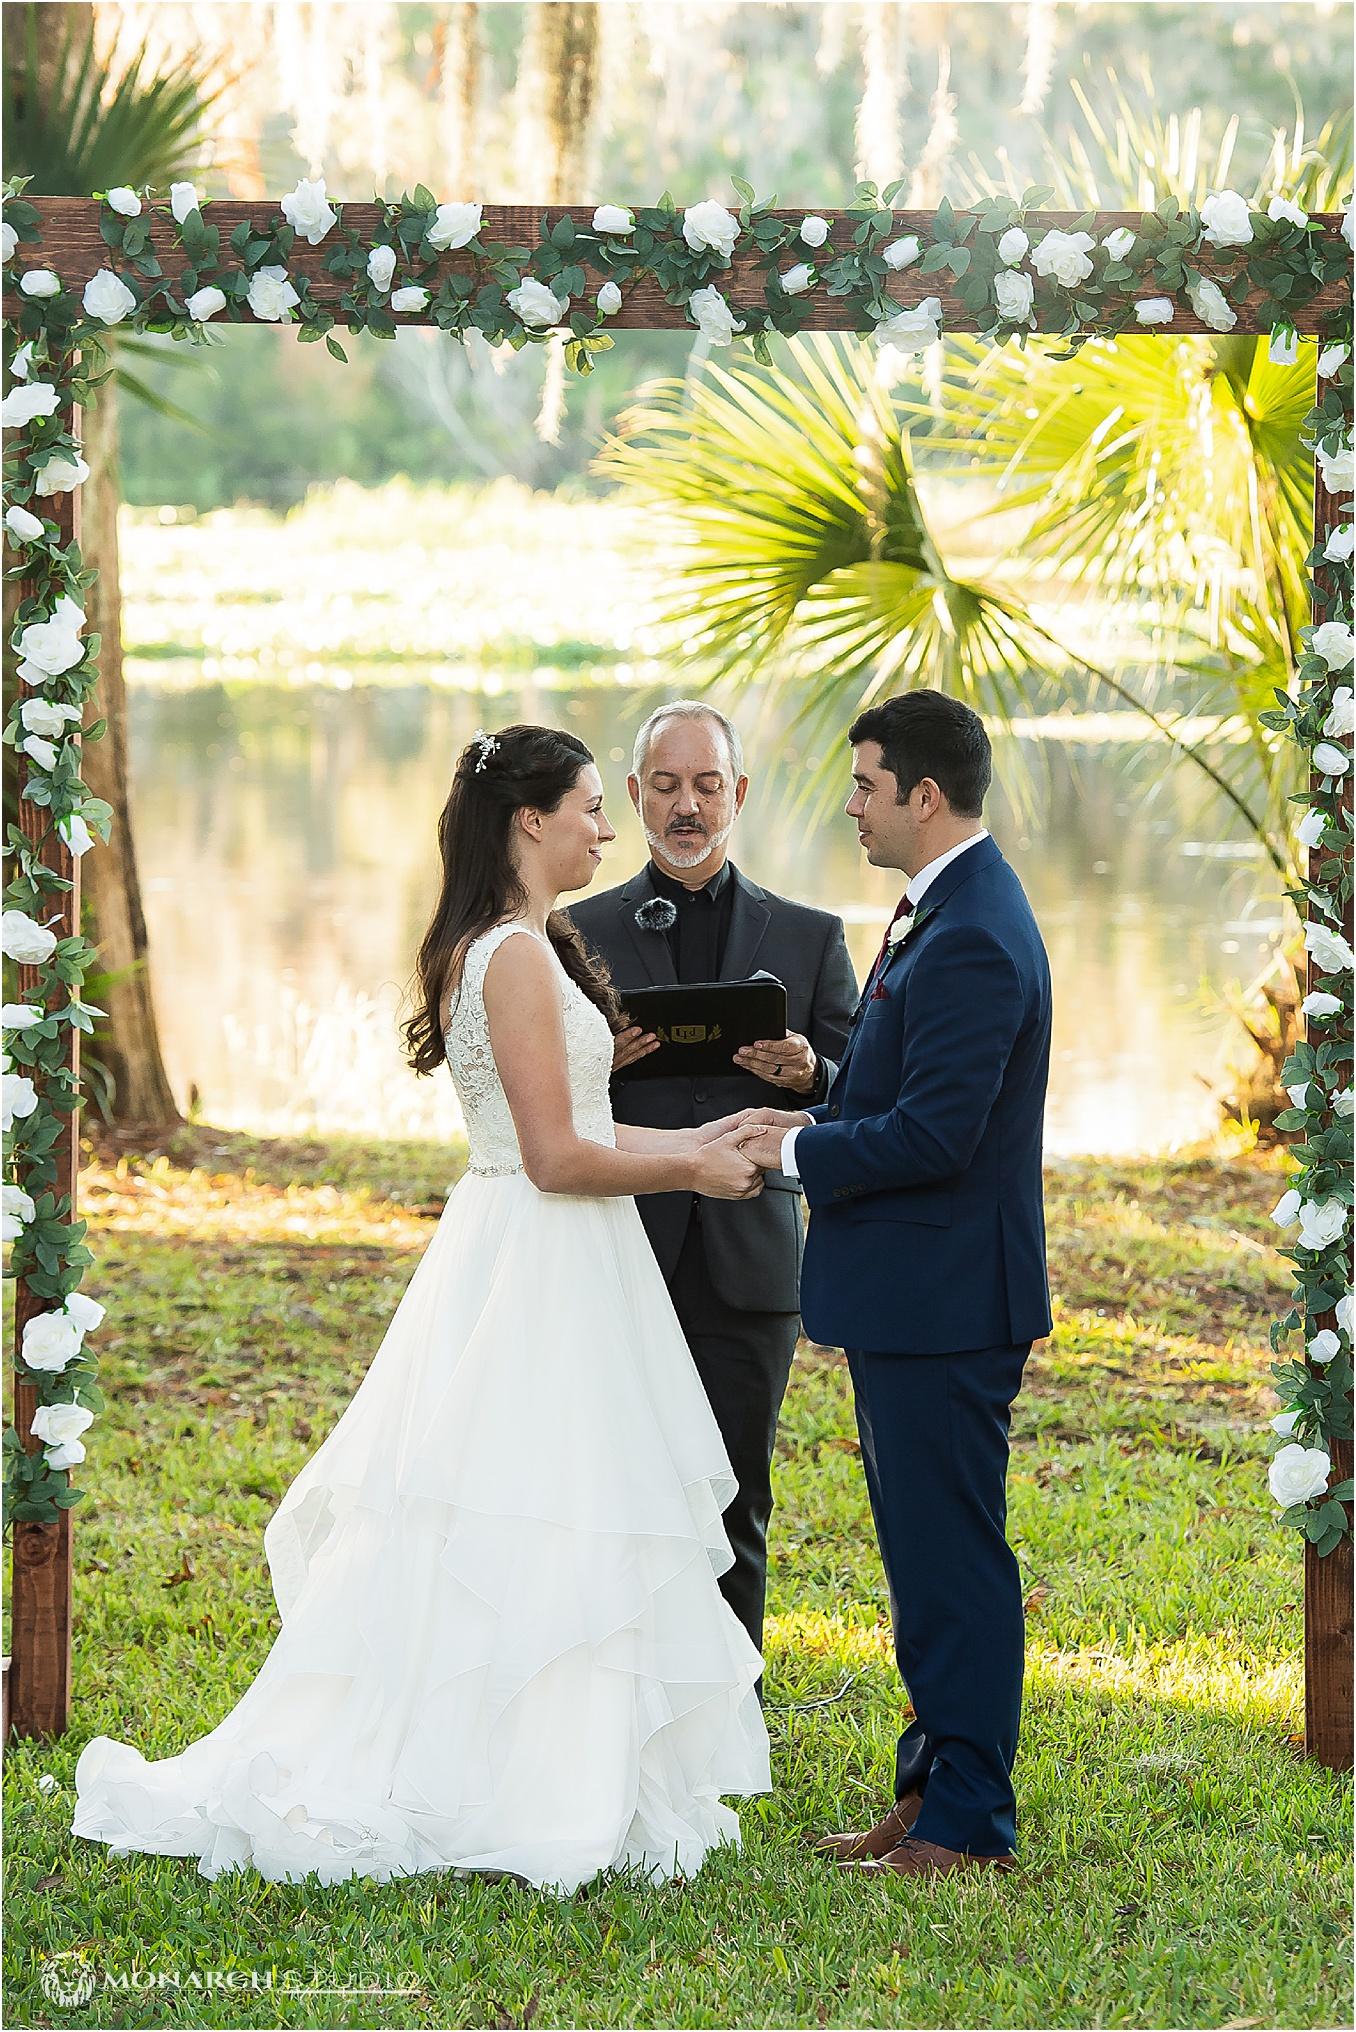 Wedding-photographer-in-sanford-florida-natural-wedding-062.jpg